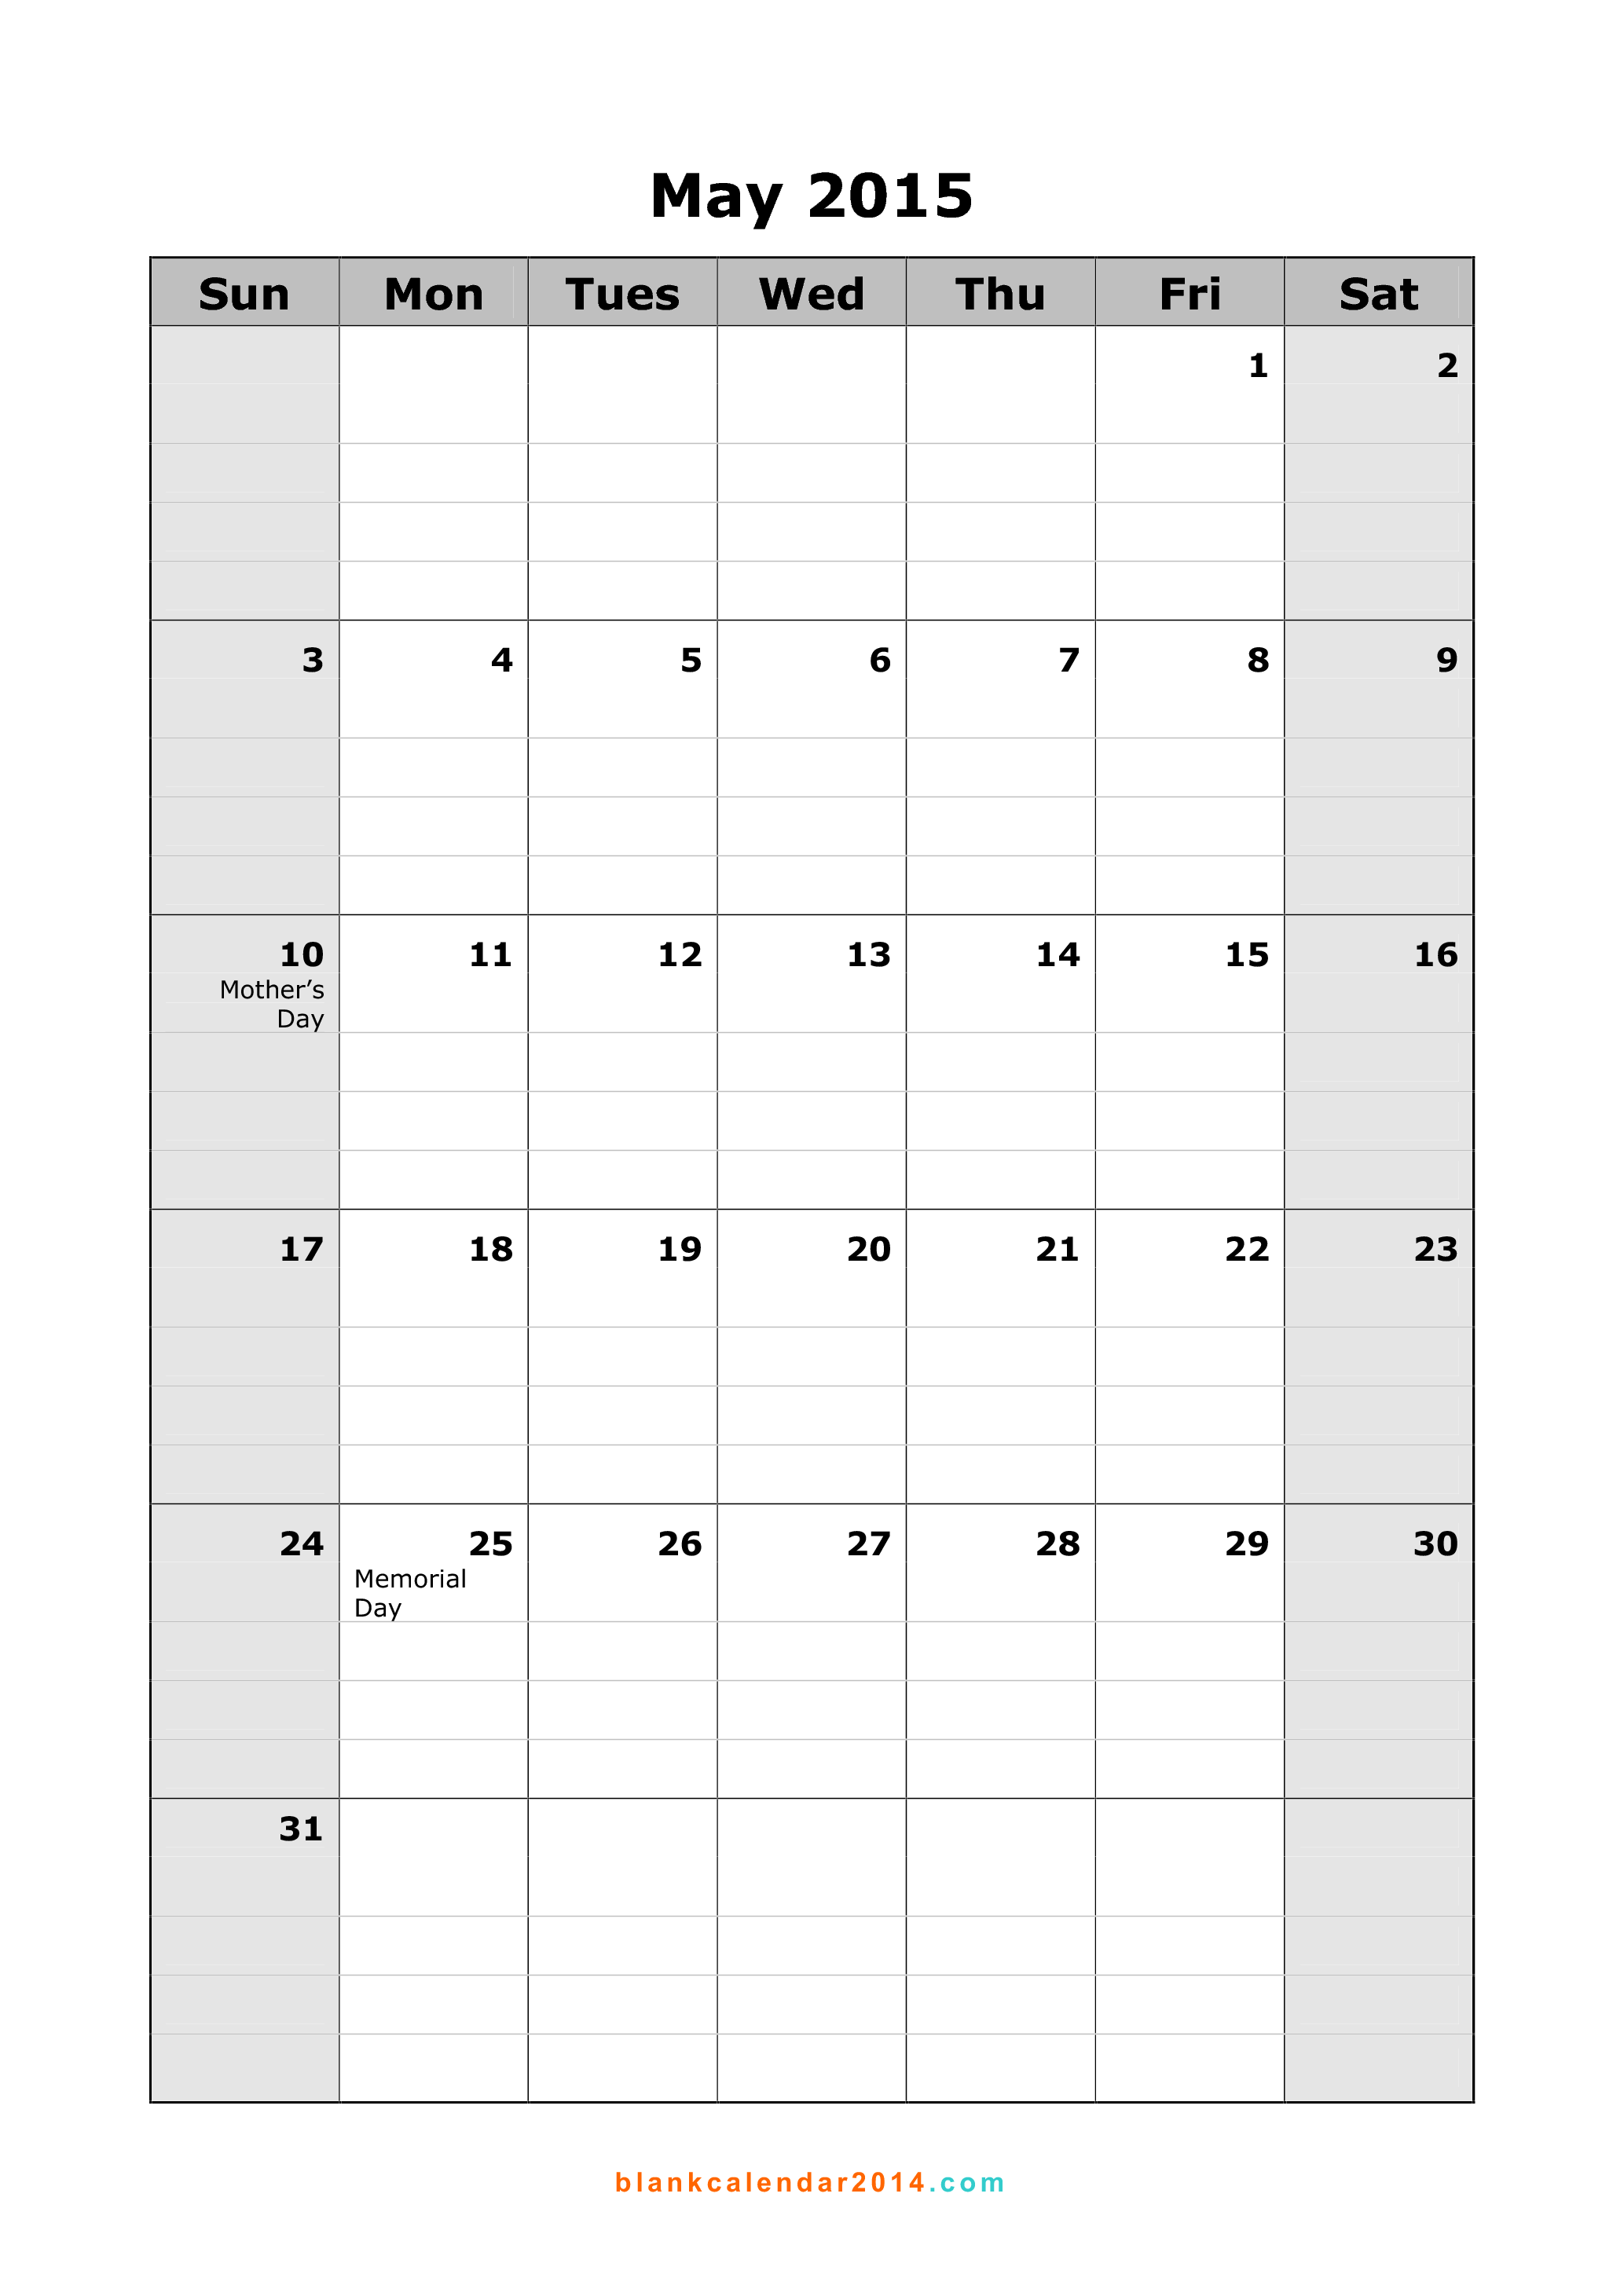 printable blank monthly calendar 2015